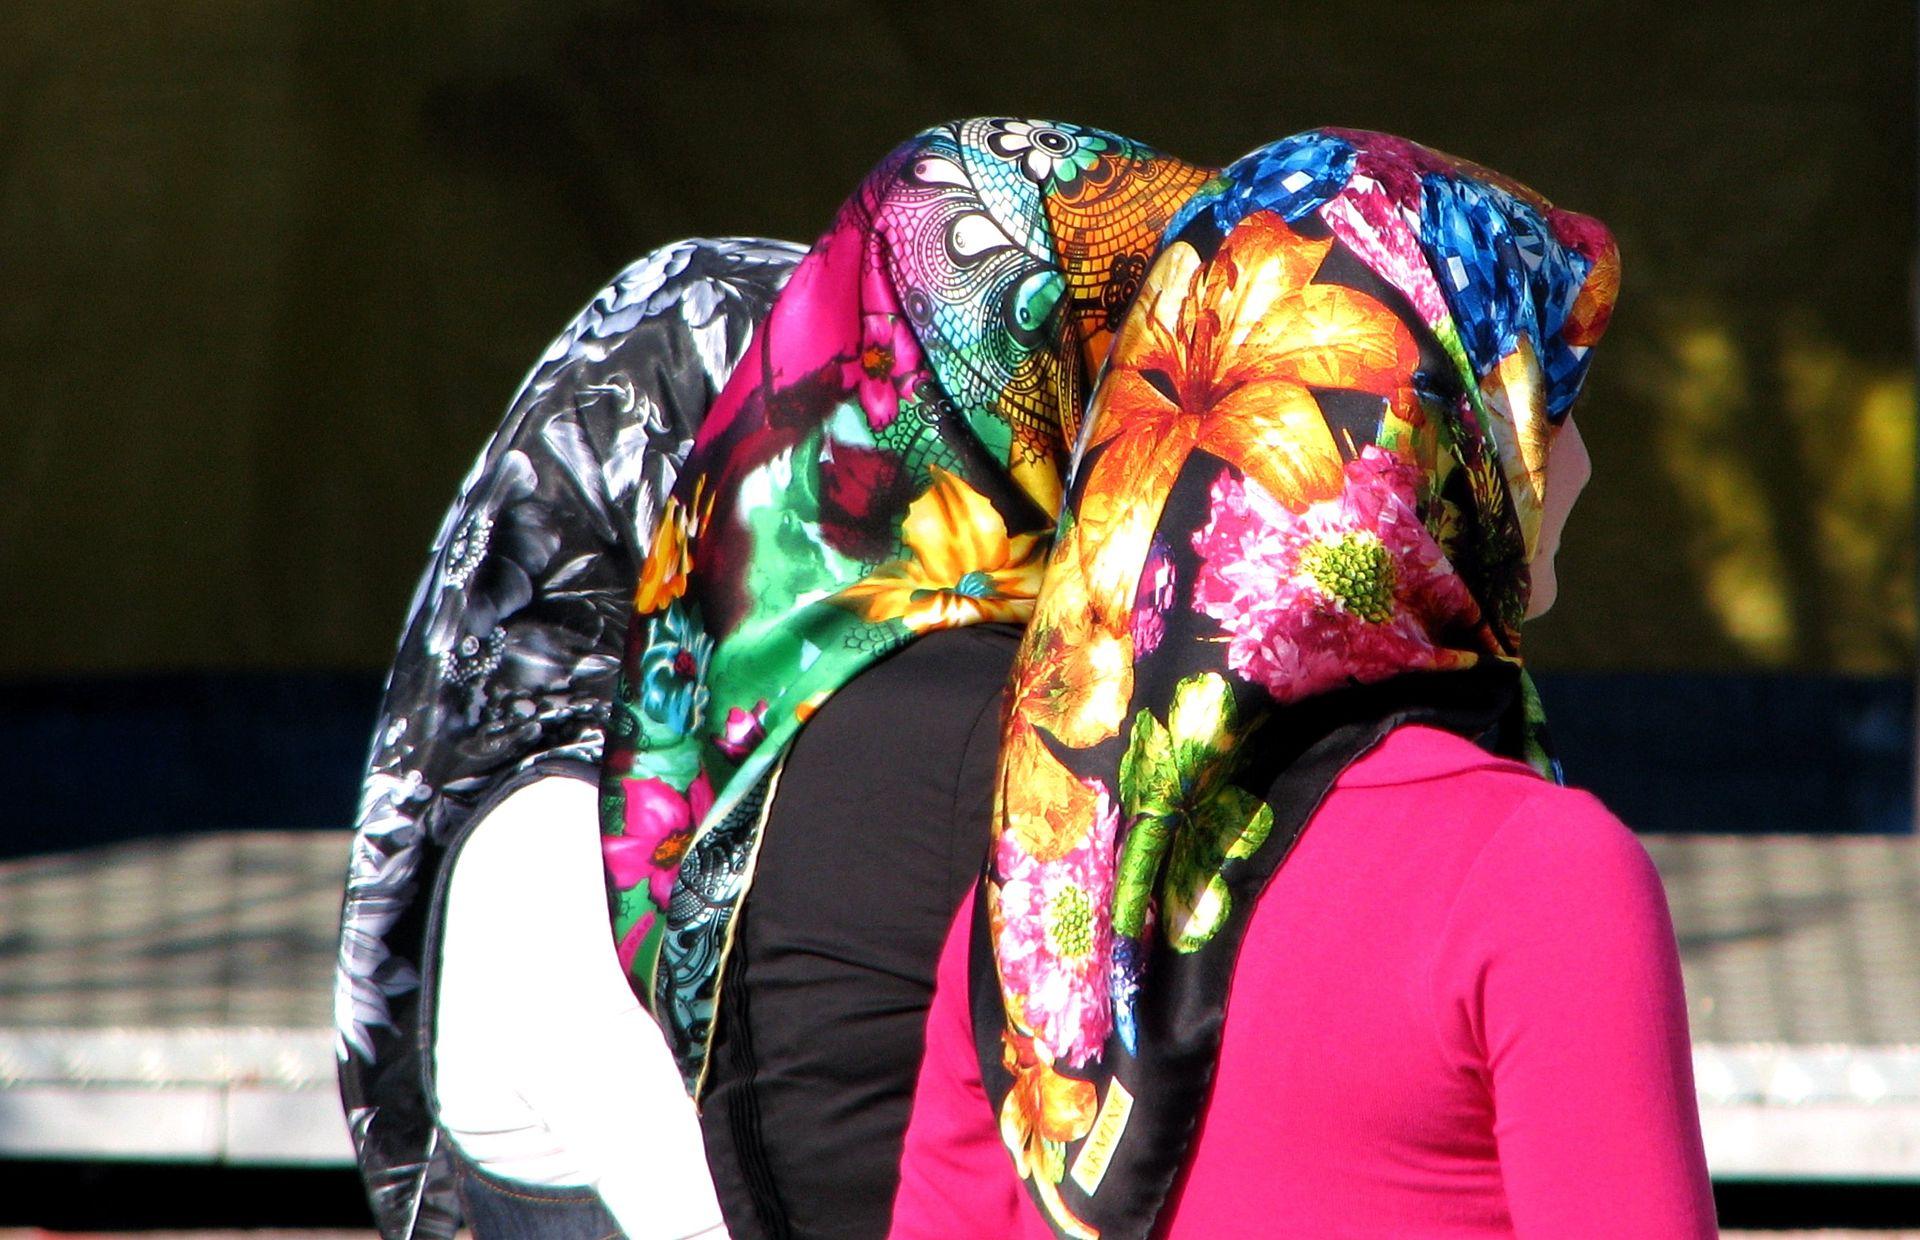 Headscarfalanya